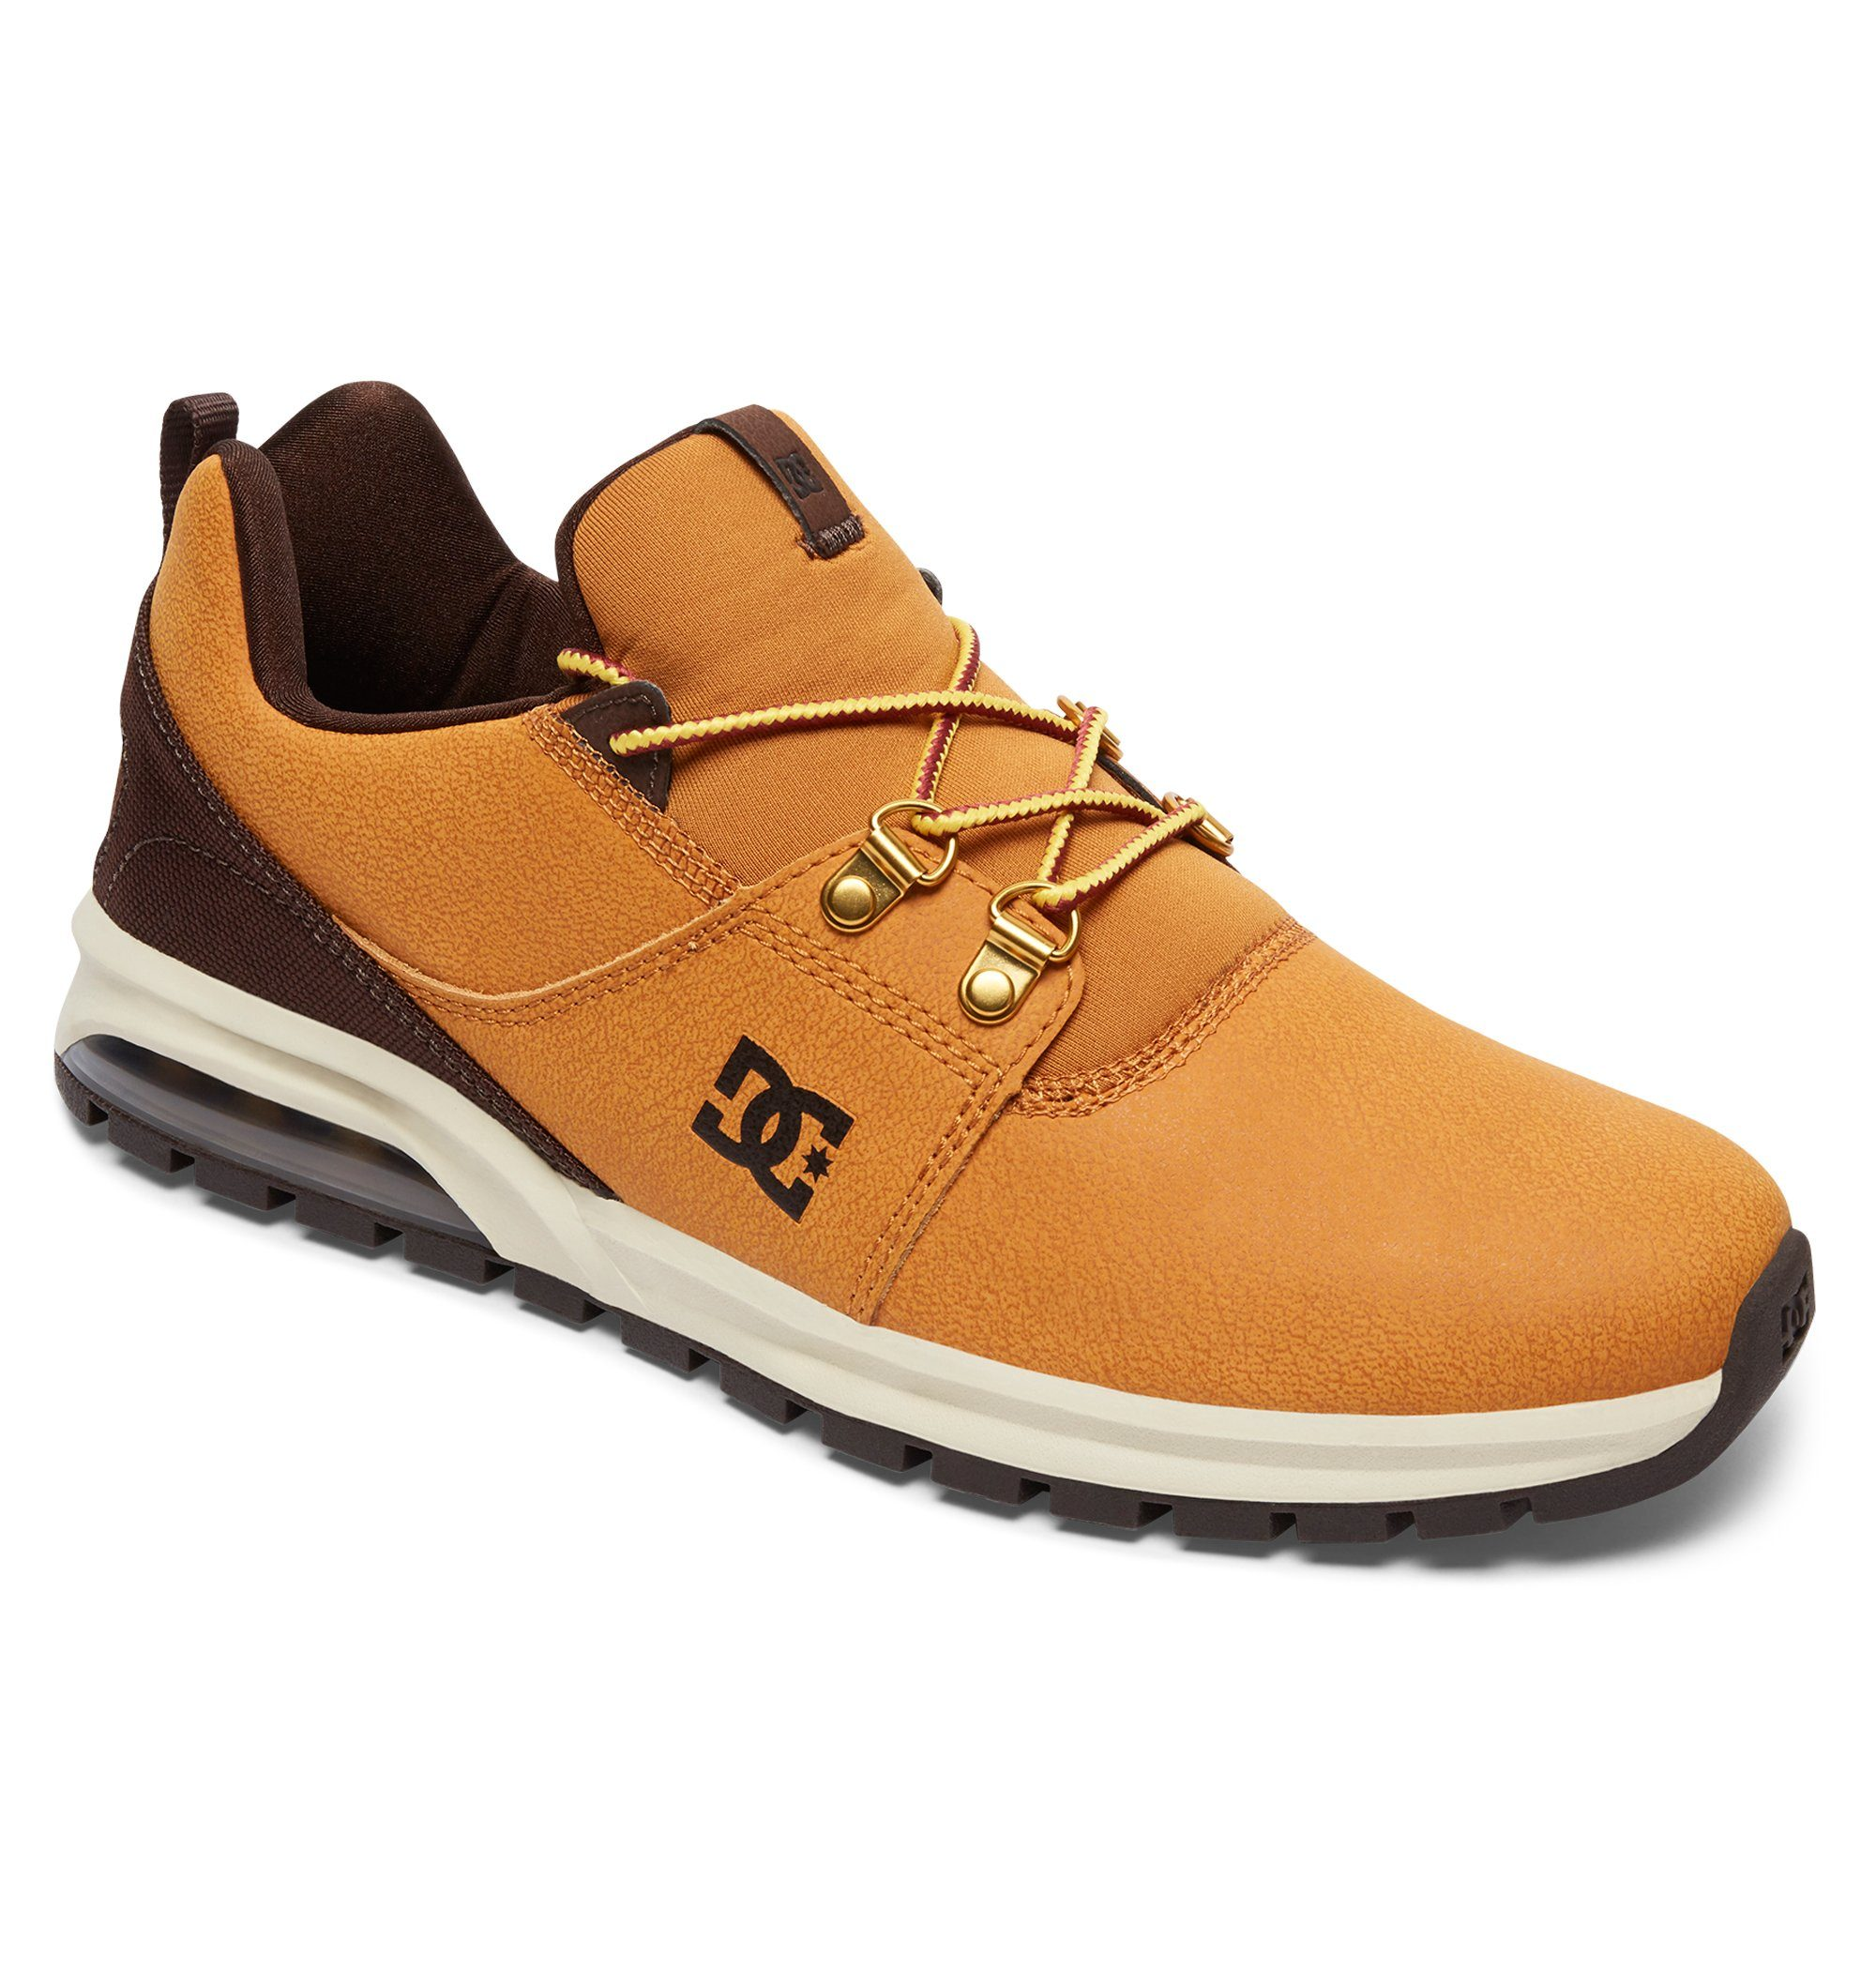 DC Shoes Schuhe Heathrow IA TR online kaufen  Wheat#ft5_slash#dk chocolate